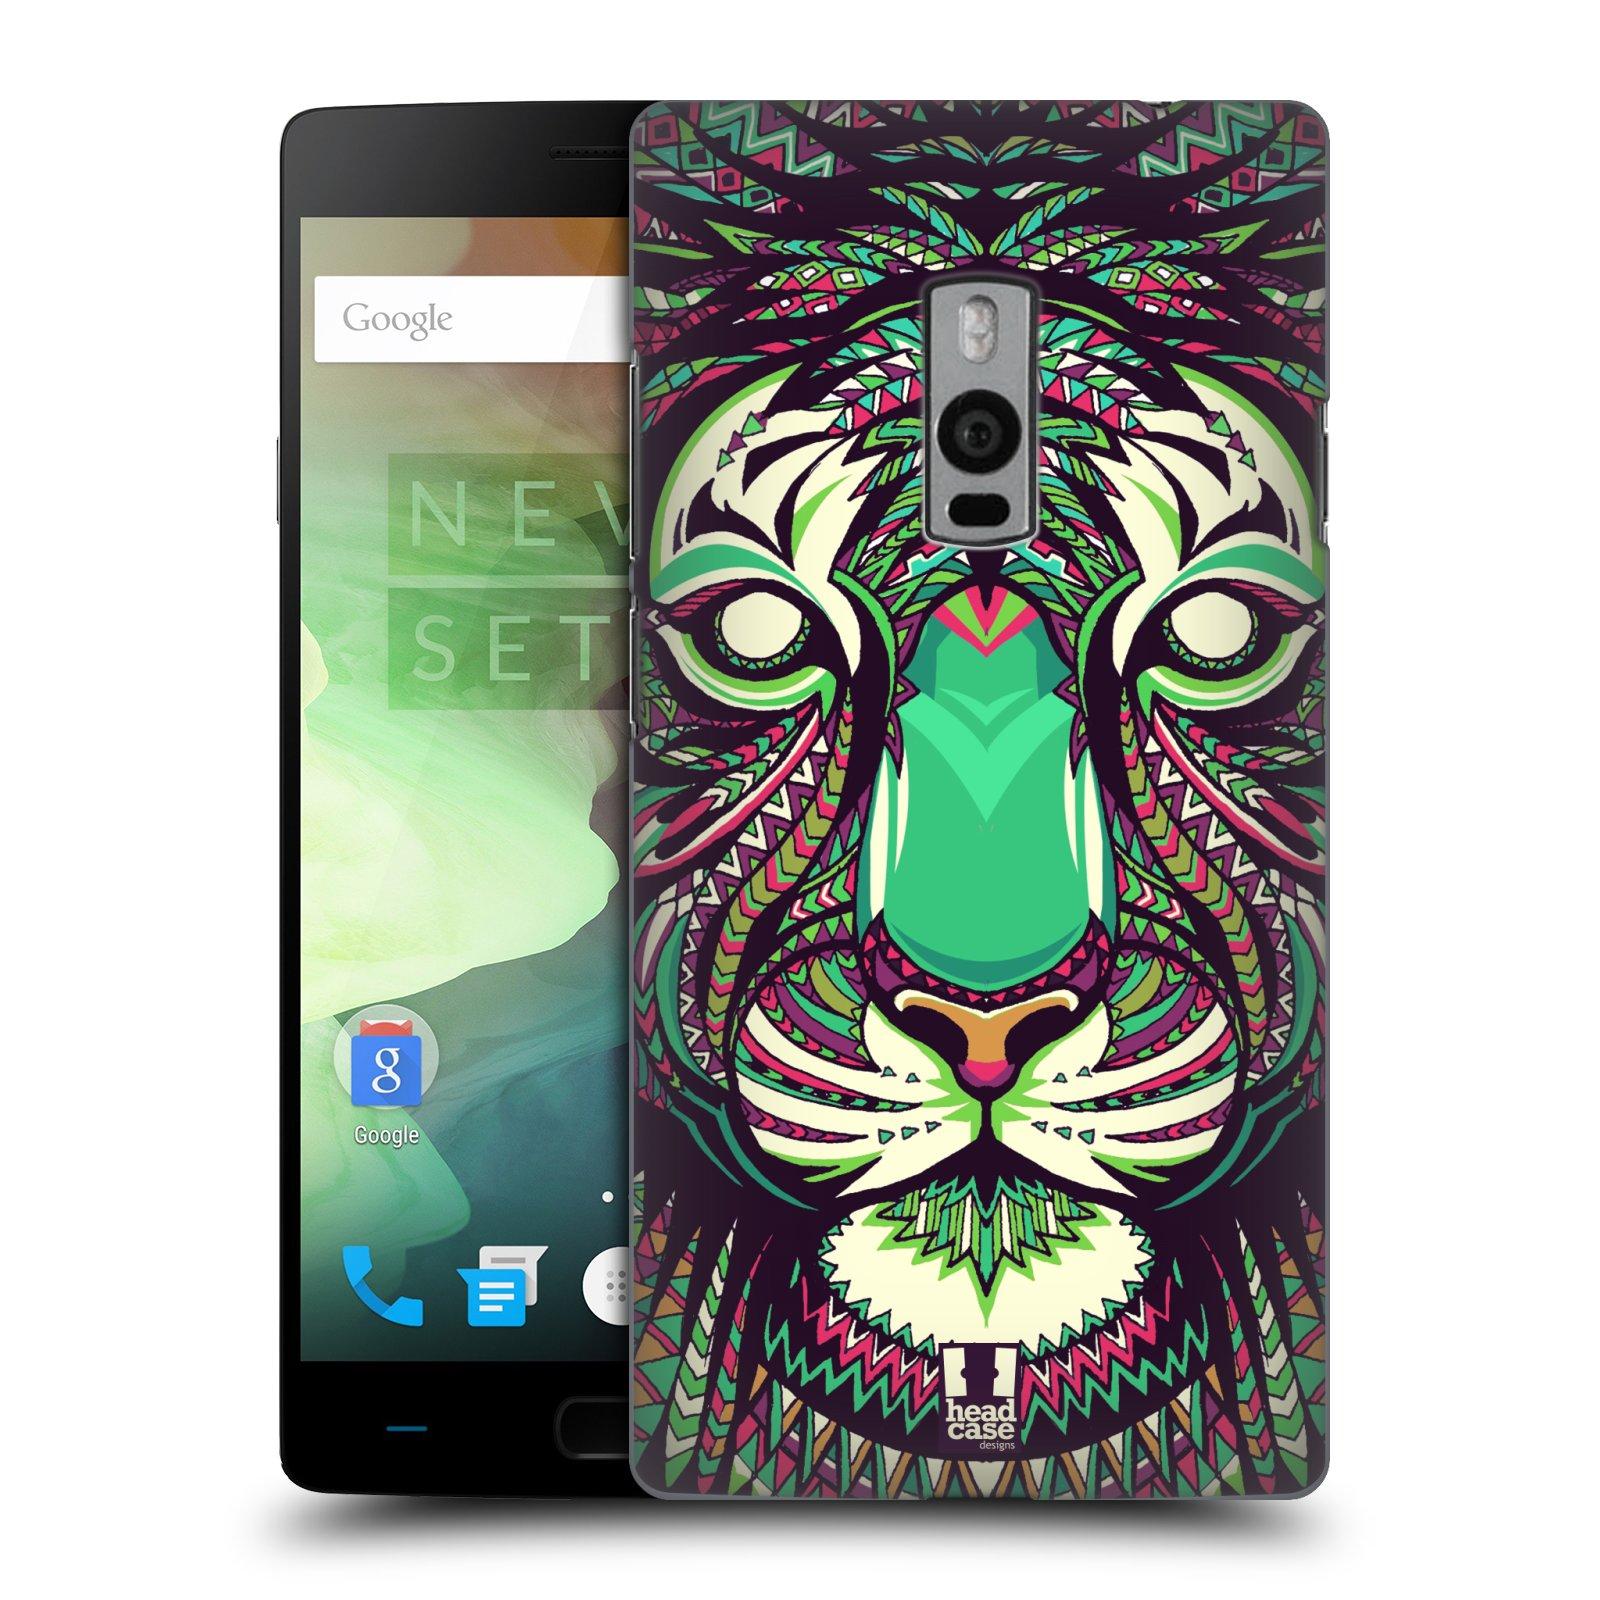 HEAD CASE pevný plastový obal na mobil OnePlus 2  ( TWO ) vzor Aztécký motiv zvíře 2 tygr